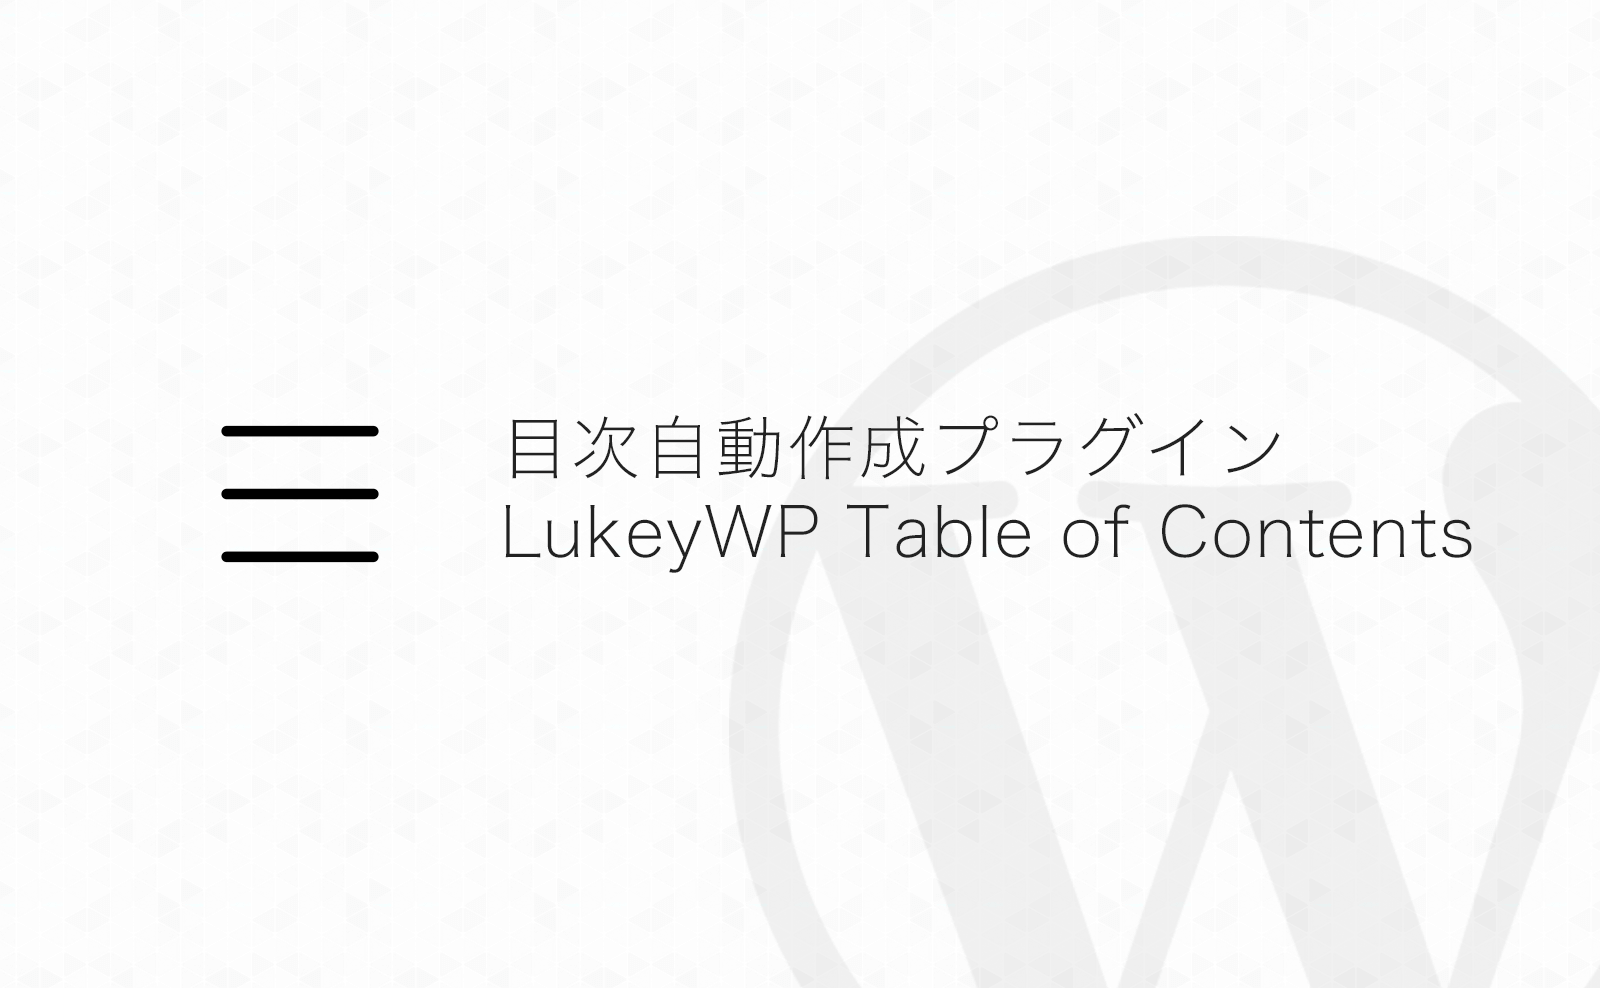 【WordPress】記事の見出しから目次を自動で作成するプラグイン「LukeyWP Table of Contents」